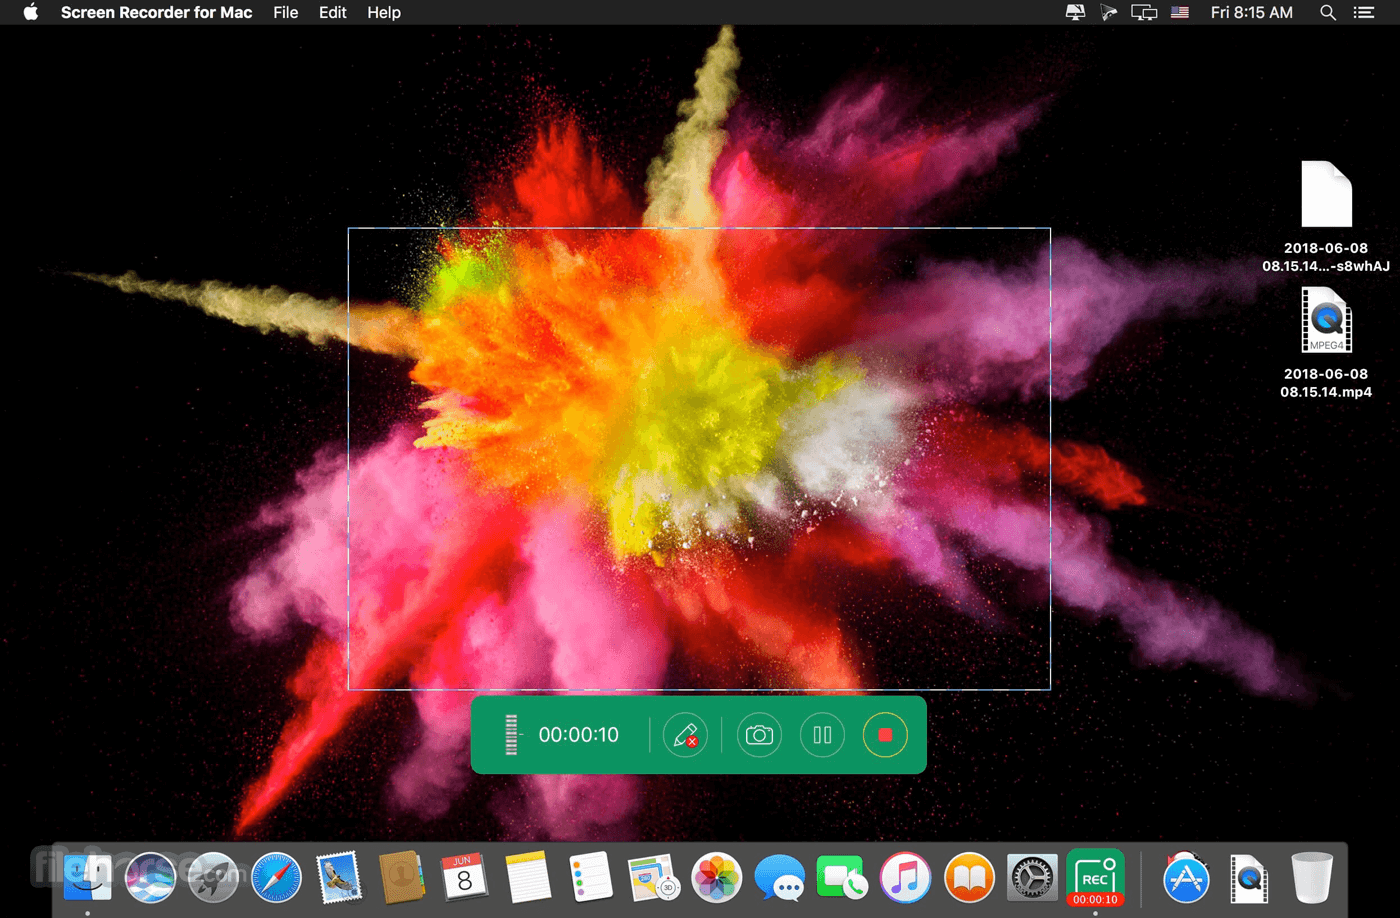 Apeaksoft Screen Recorder 2.0.26 Screenshot 2